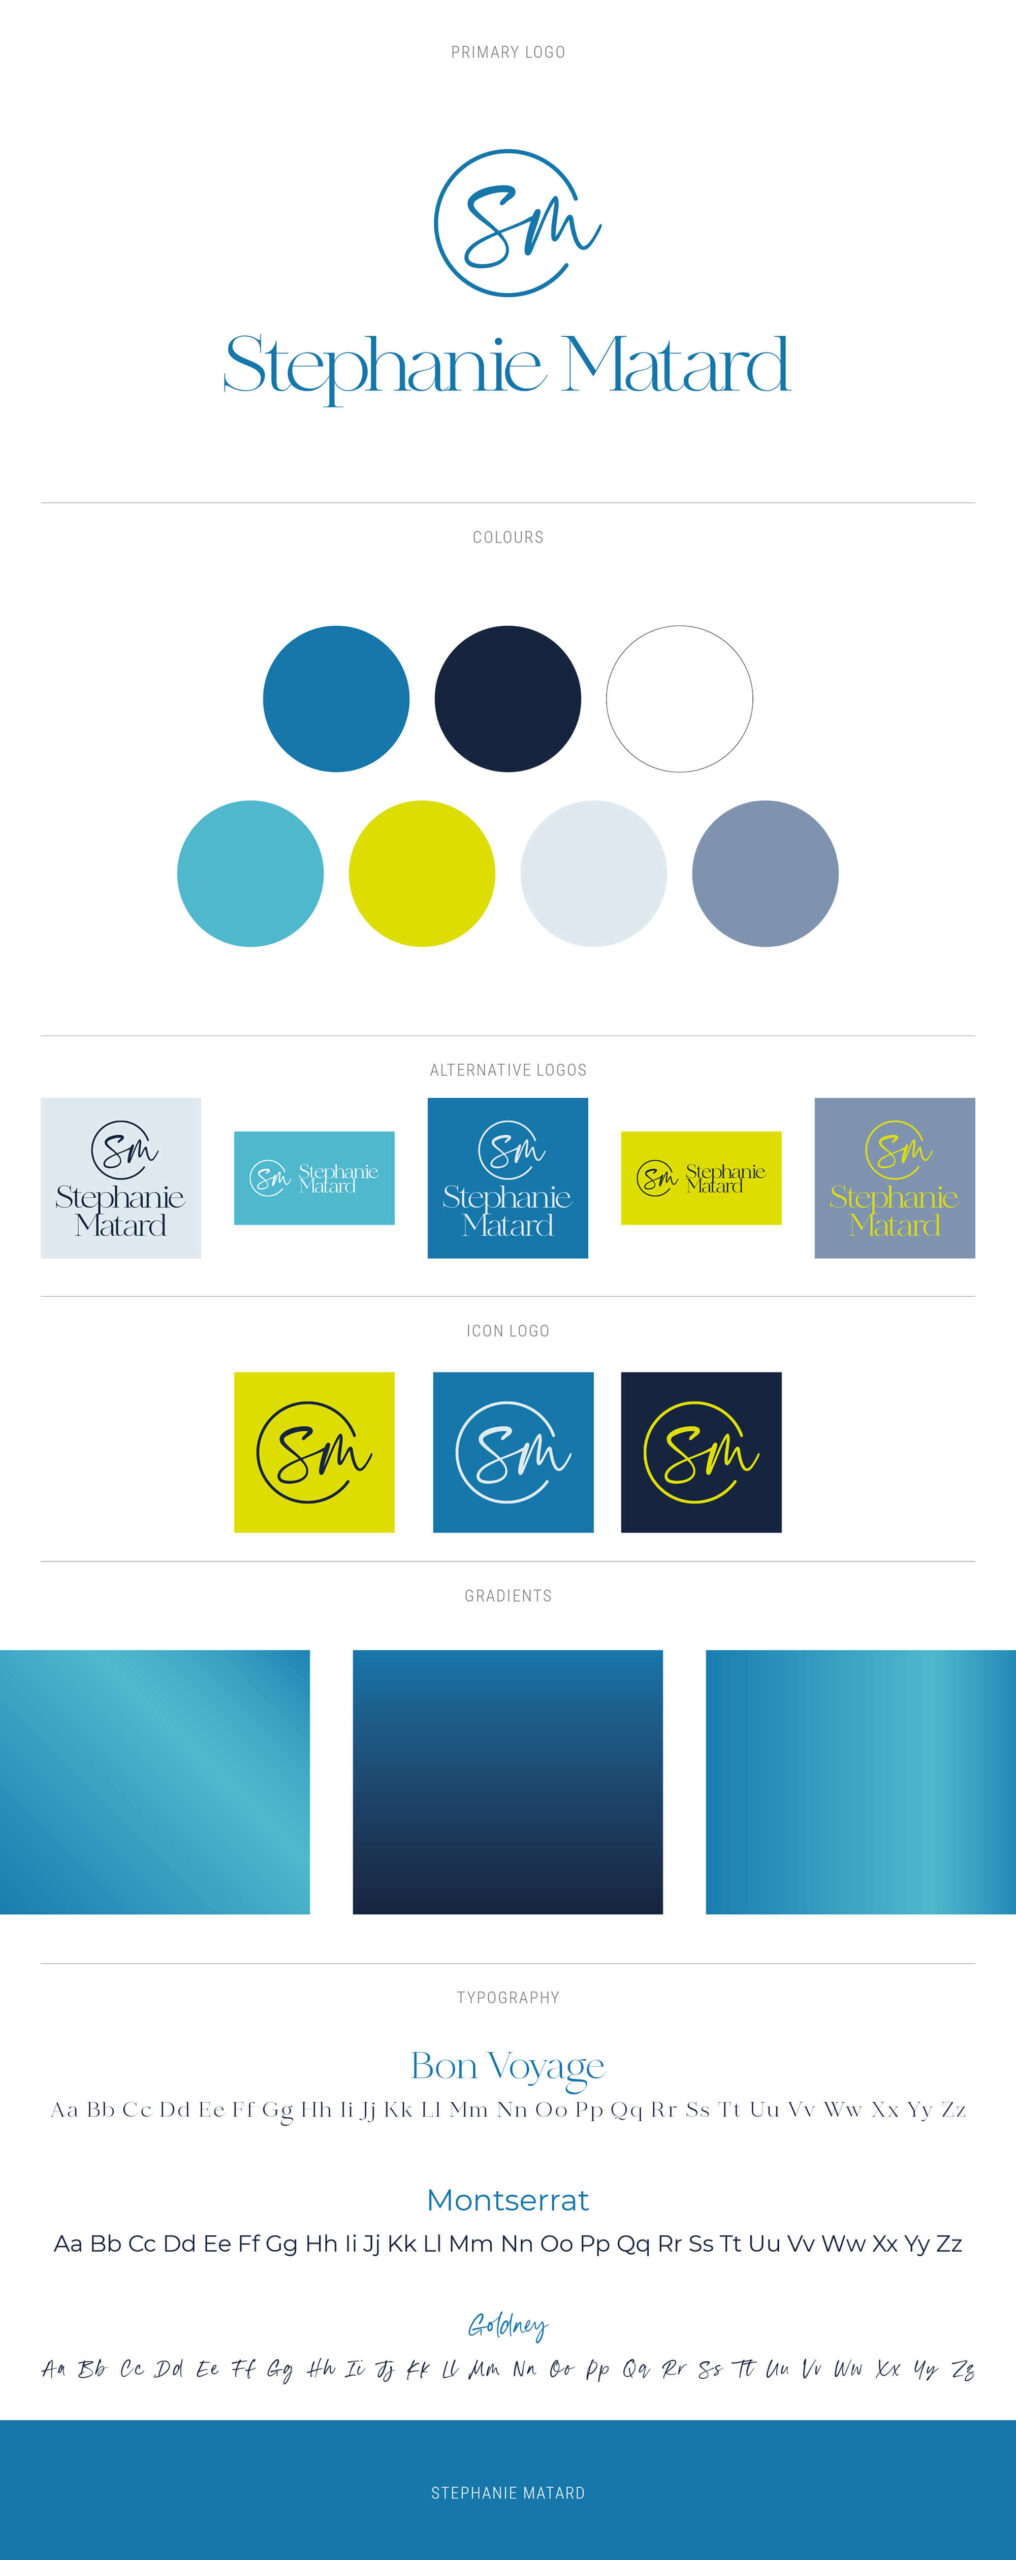 Stephanie Matard-Voiceover - brand logo and colours